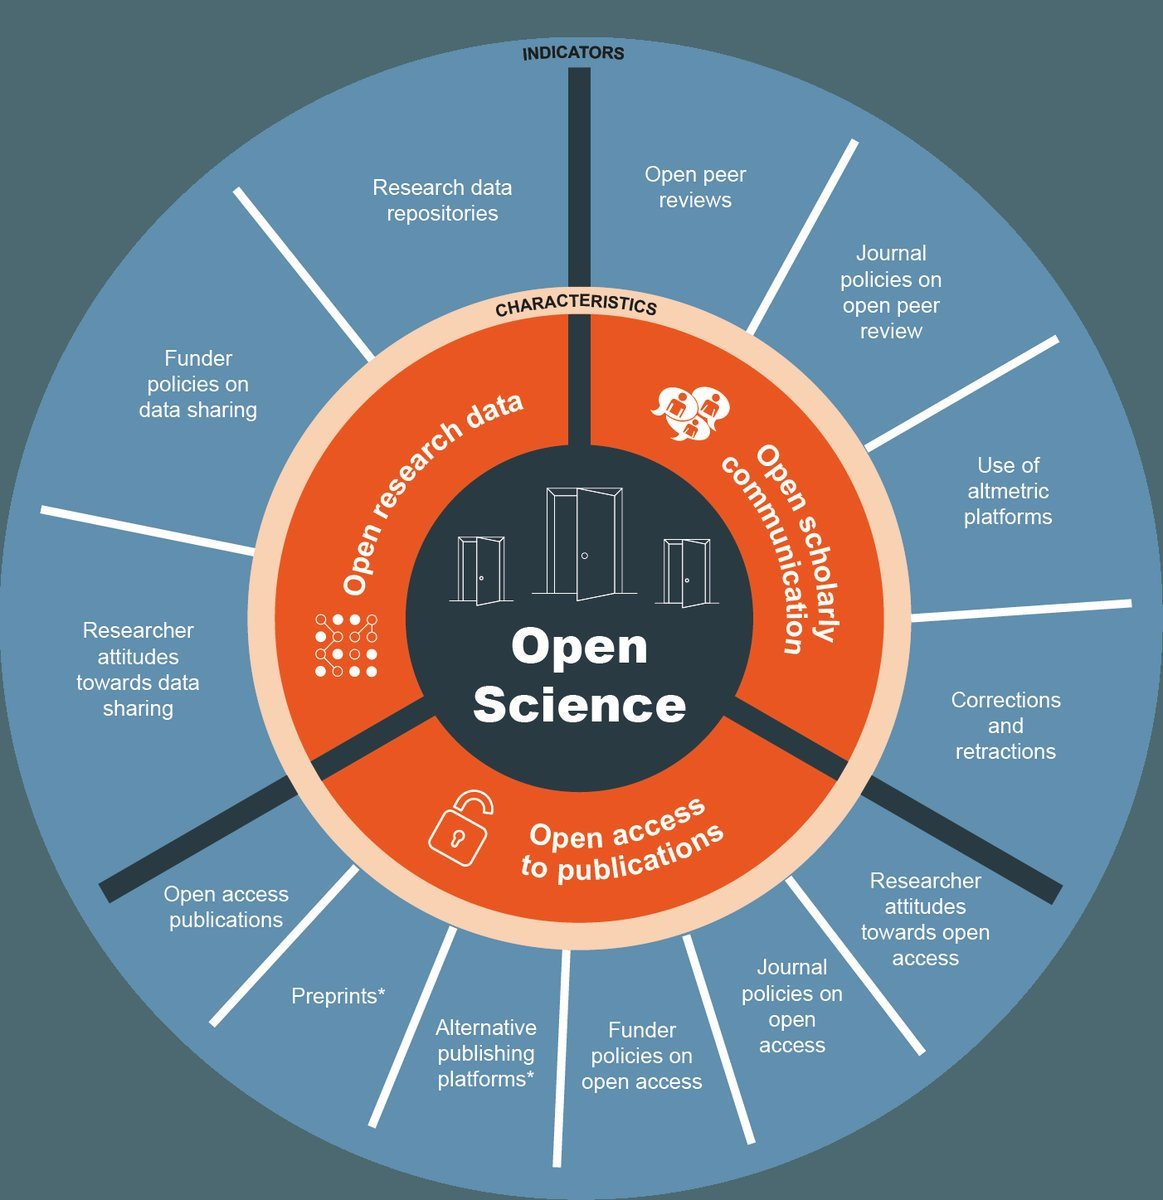 What is #OpenScience ? #DataScience #BigData #AI #IoT #Defstar5 #Mpgvip #MachineLearning #IIoT @binaryloom @cloudpreacher<br>http://pic.twitter.com/D8kkjmxhYO